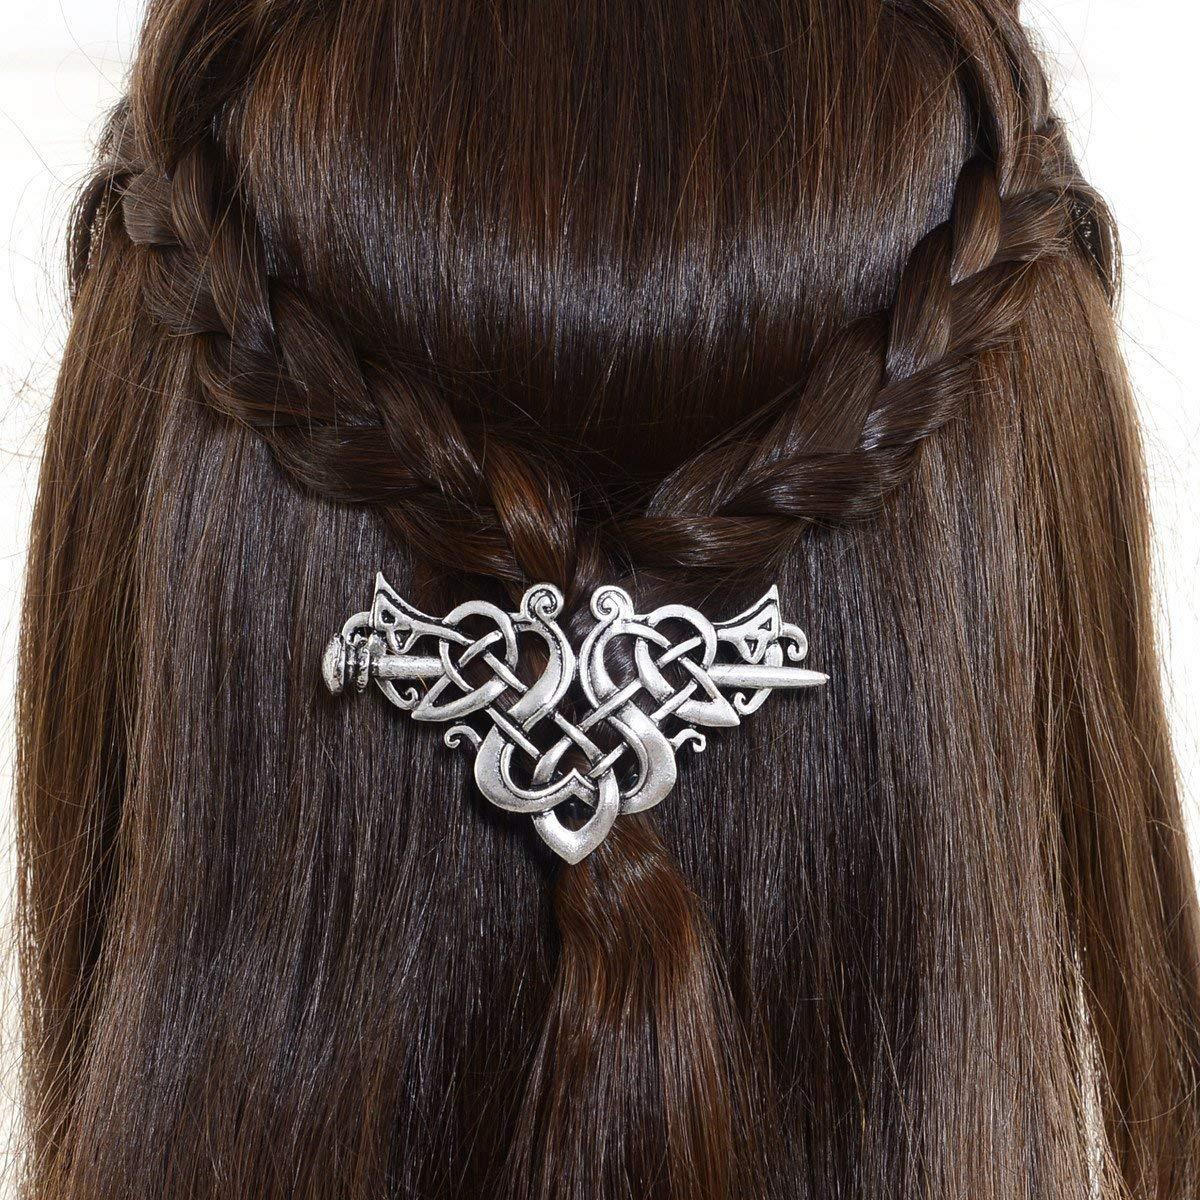 Viking Celtic Hair Sticks Hairpin-Viking Hair Clip Men Antique Silver Hair Sticks Hairpin Triangle Clips for Long Hair Stick Slide Irish Hair Accessories Celtic Knot Hair Pin Viking Jewelry Women